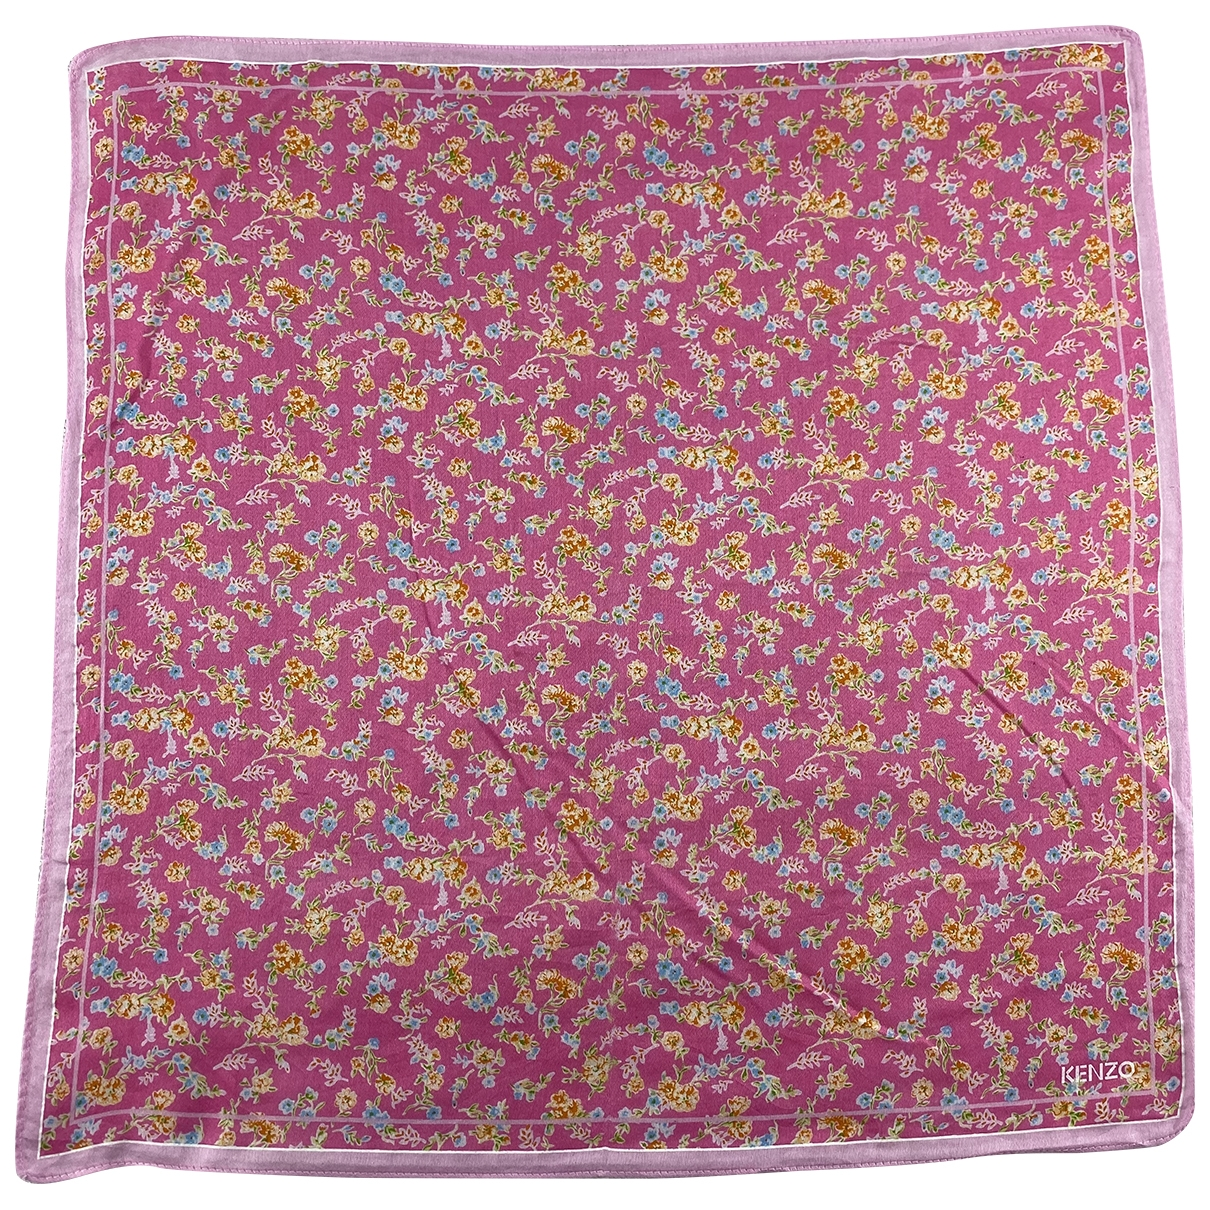 Kenzo - Foulard   pour femme en coton